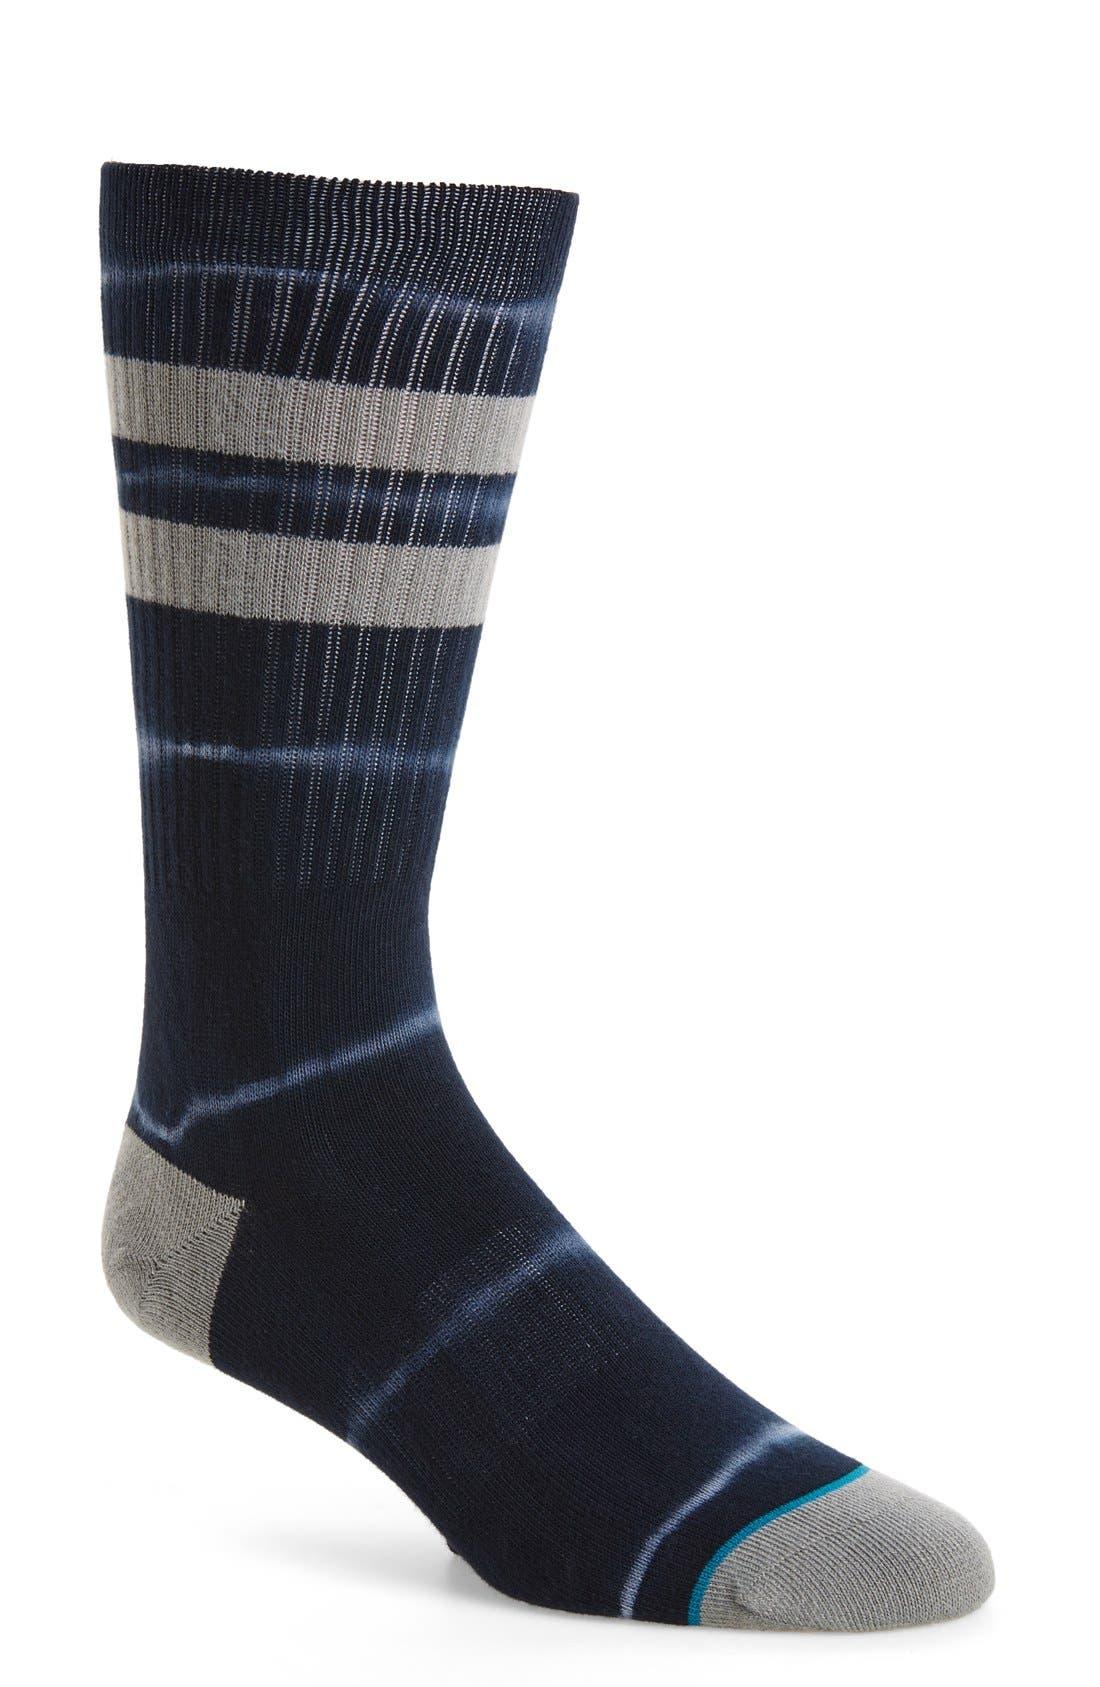 Main Image - Stance 6AM Classic Crew Socks